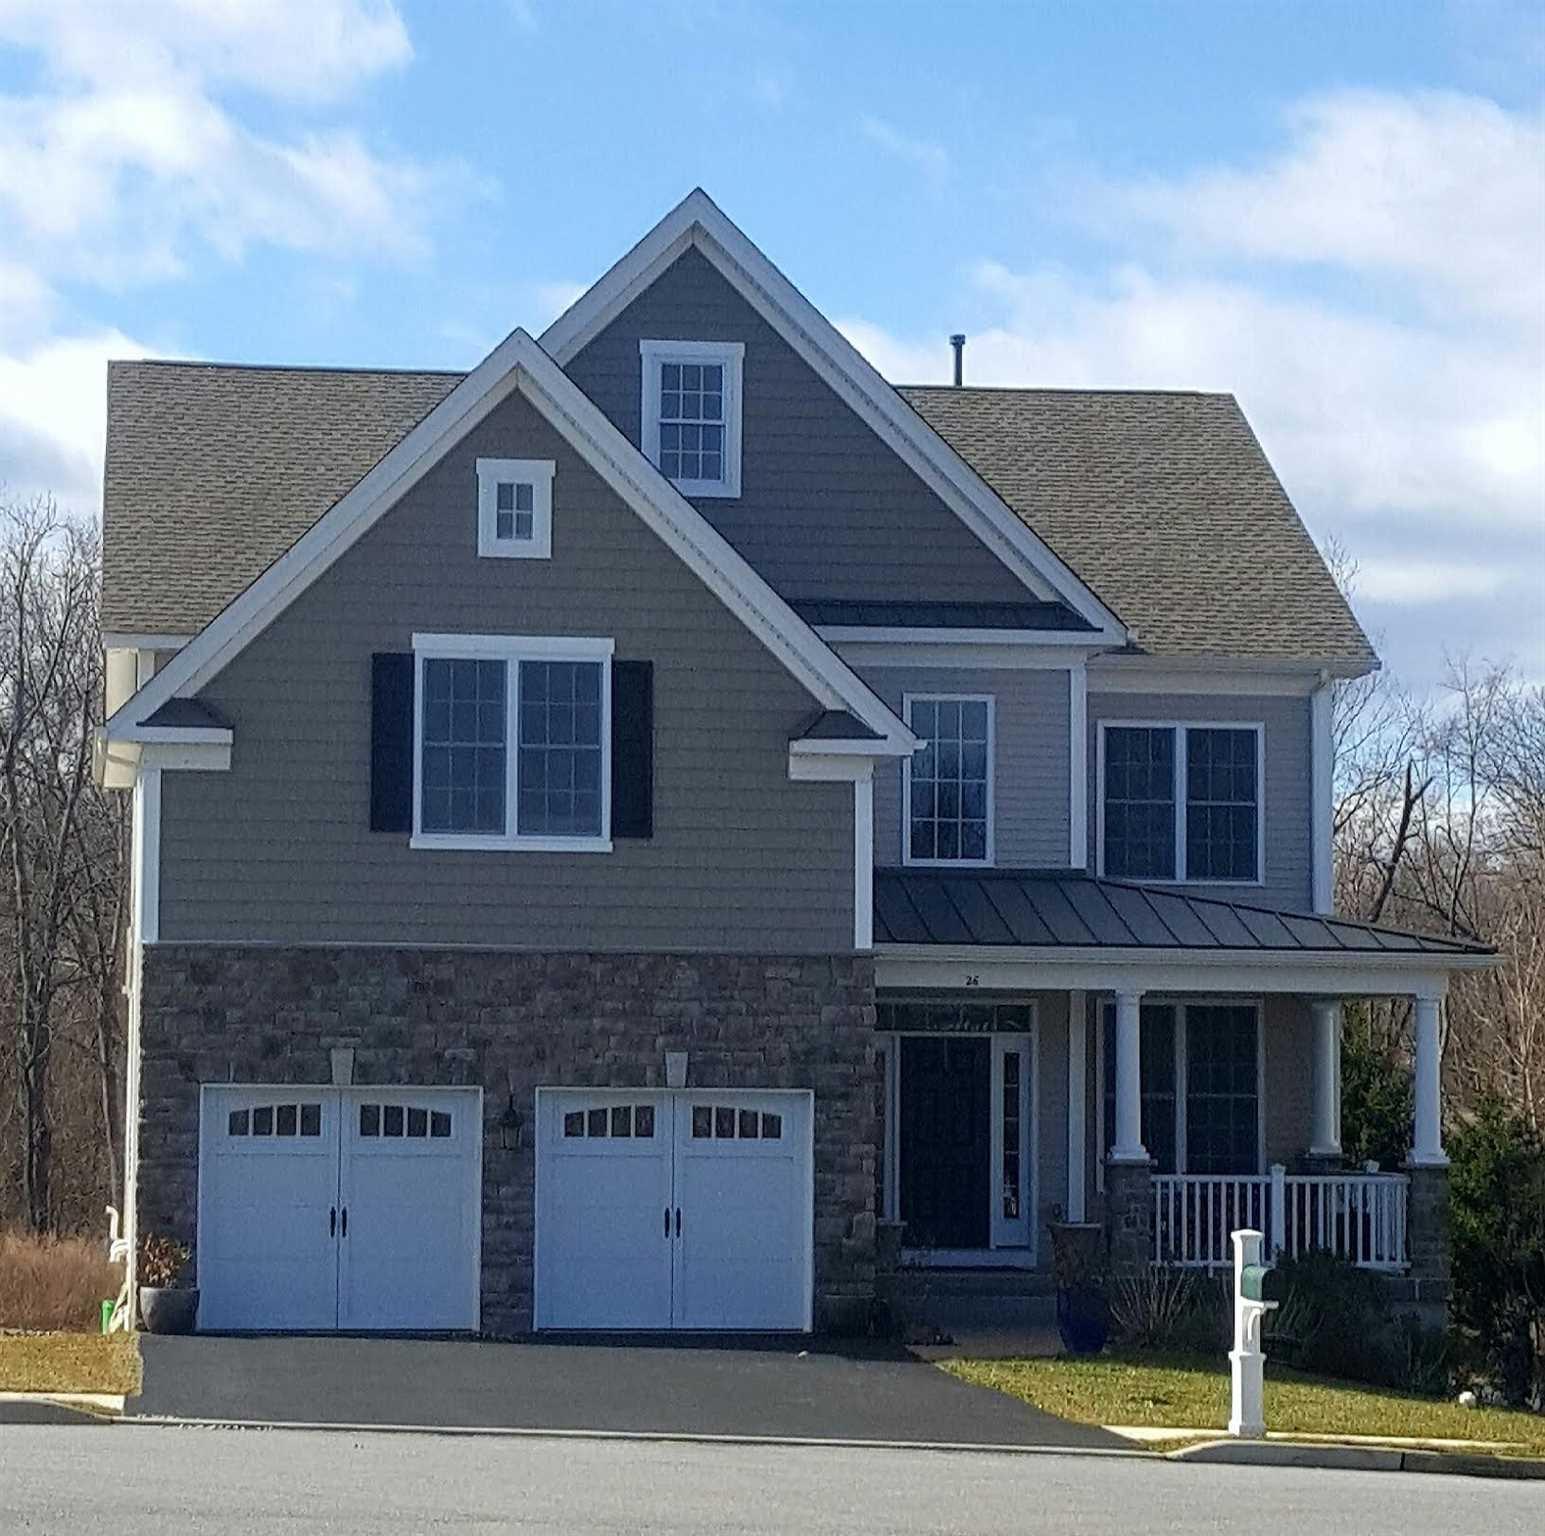 Single Family Home for Sale at 26 SASSAFRAS Circle 26 SASSAFRAS Circle East Fishkill, New York 12533 United States